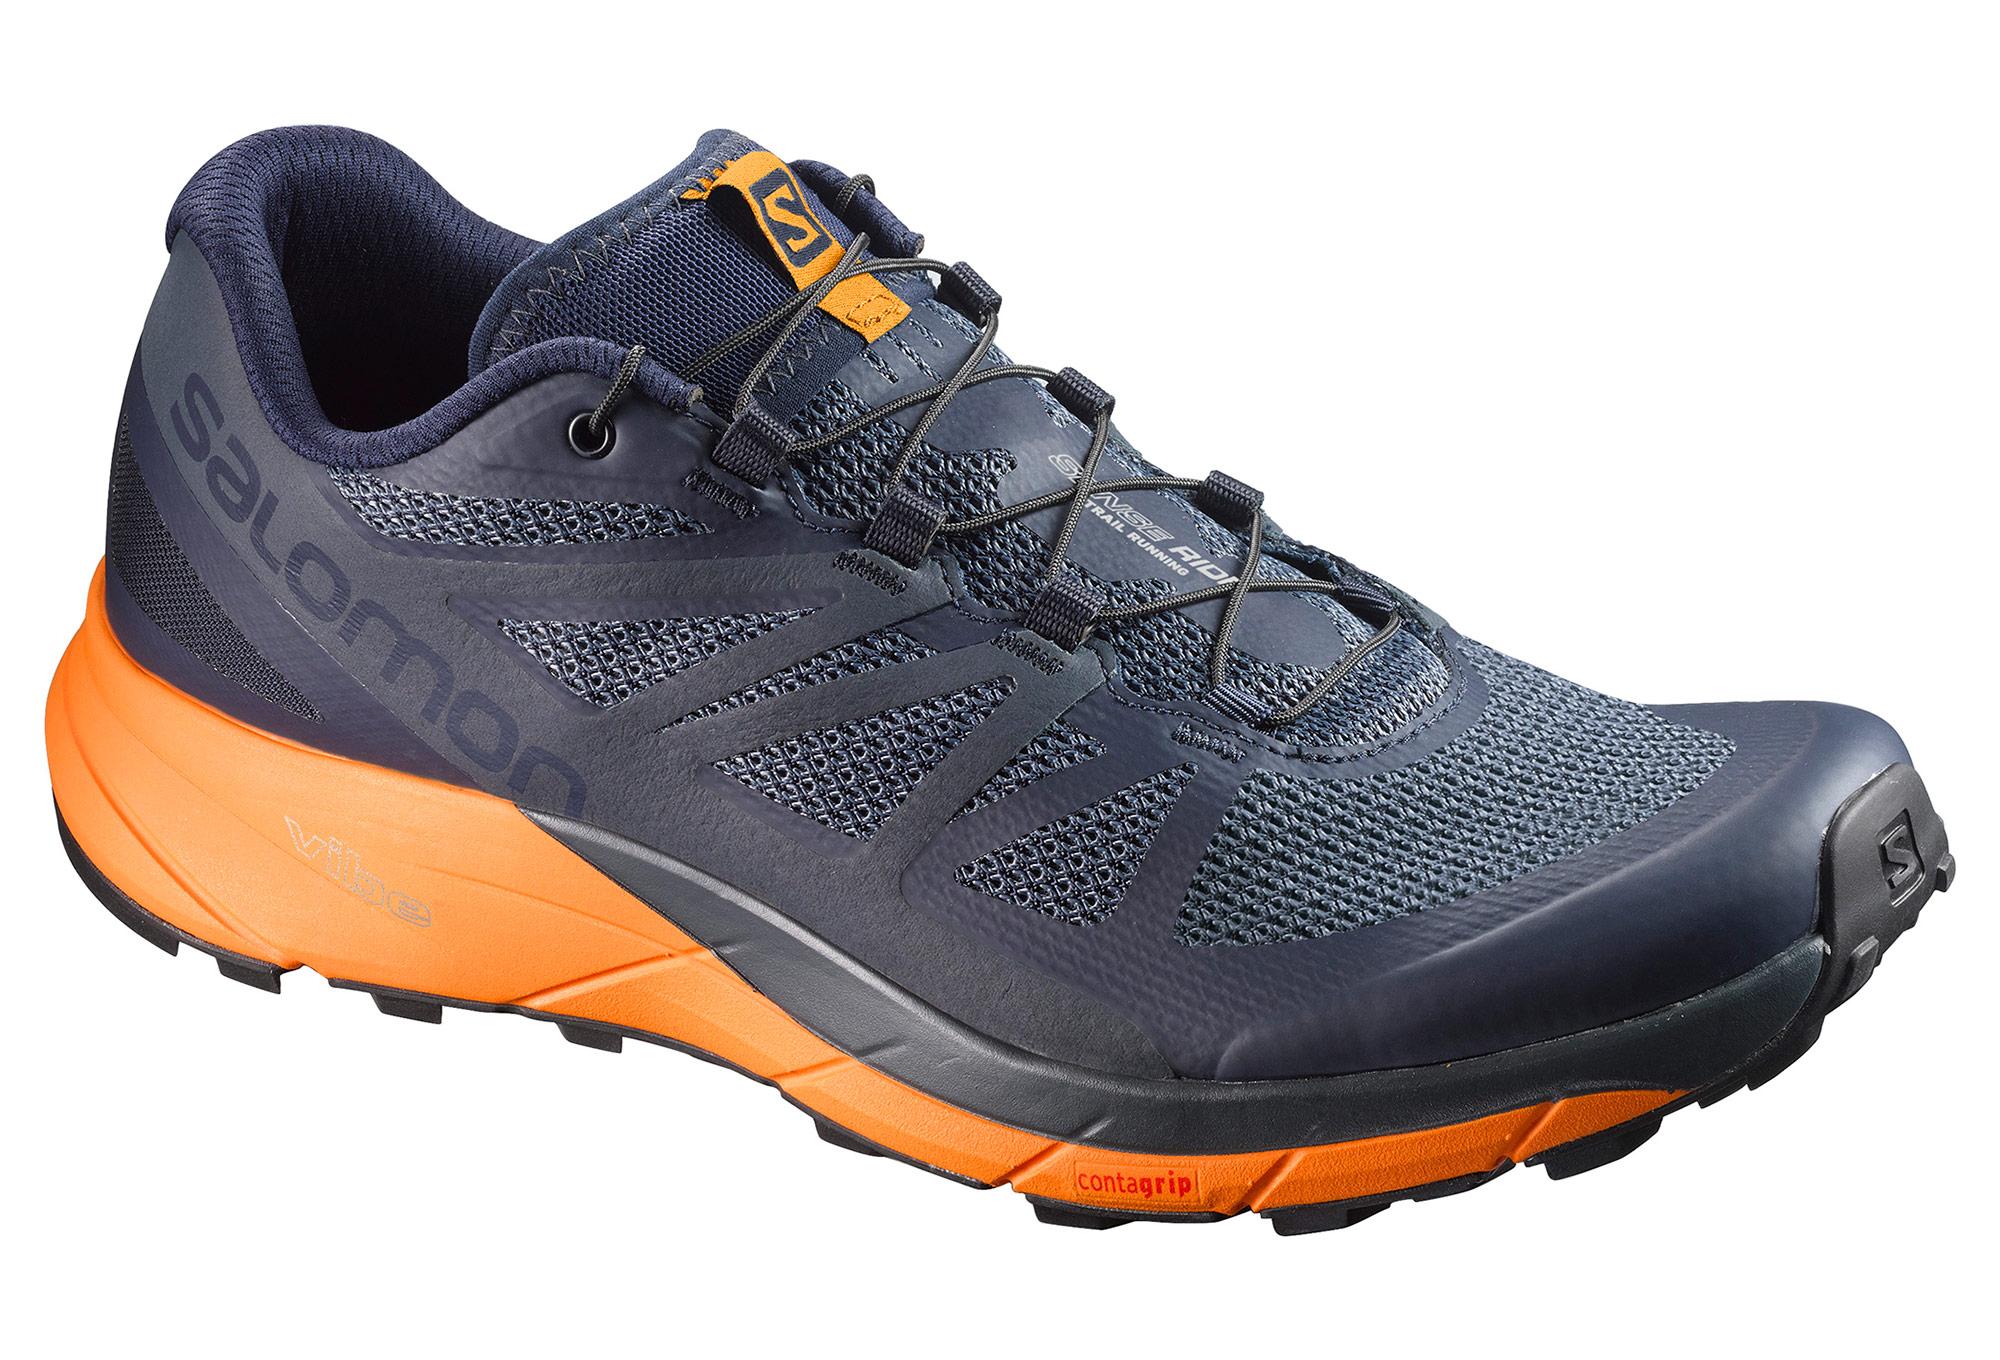 De Sense Orange Bleu Trail Salomon Ride Chaussures L45AR3j